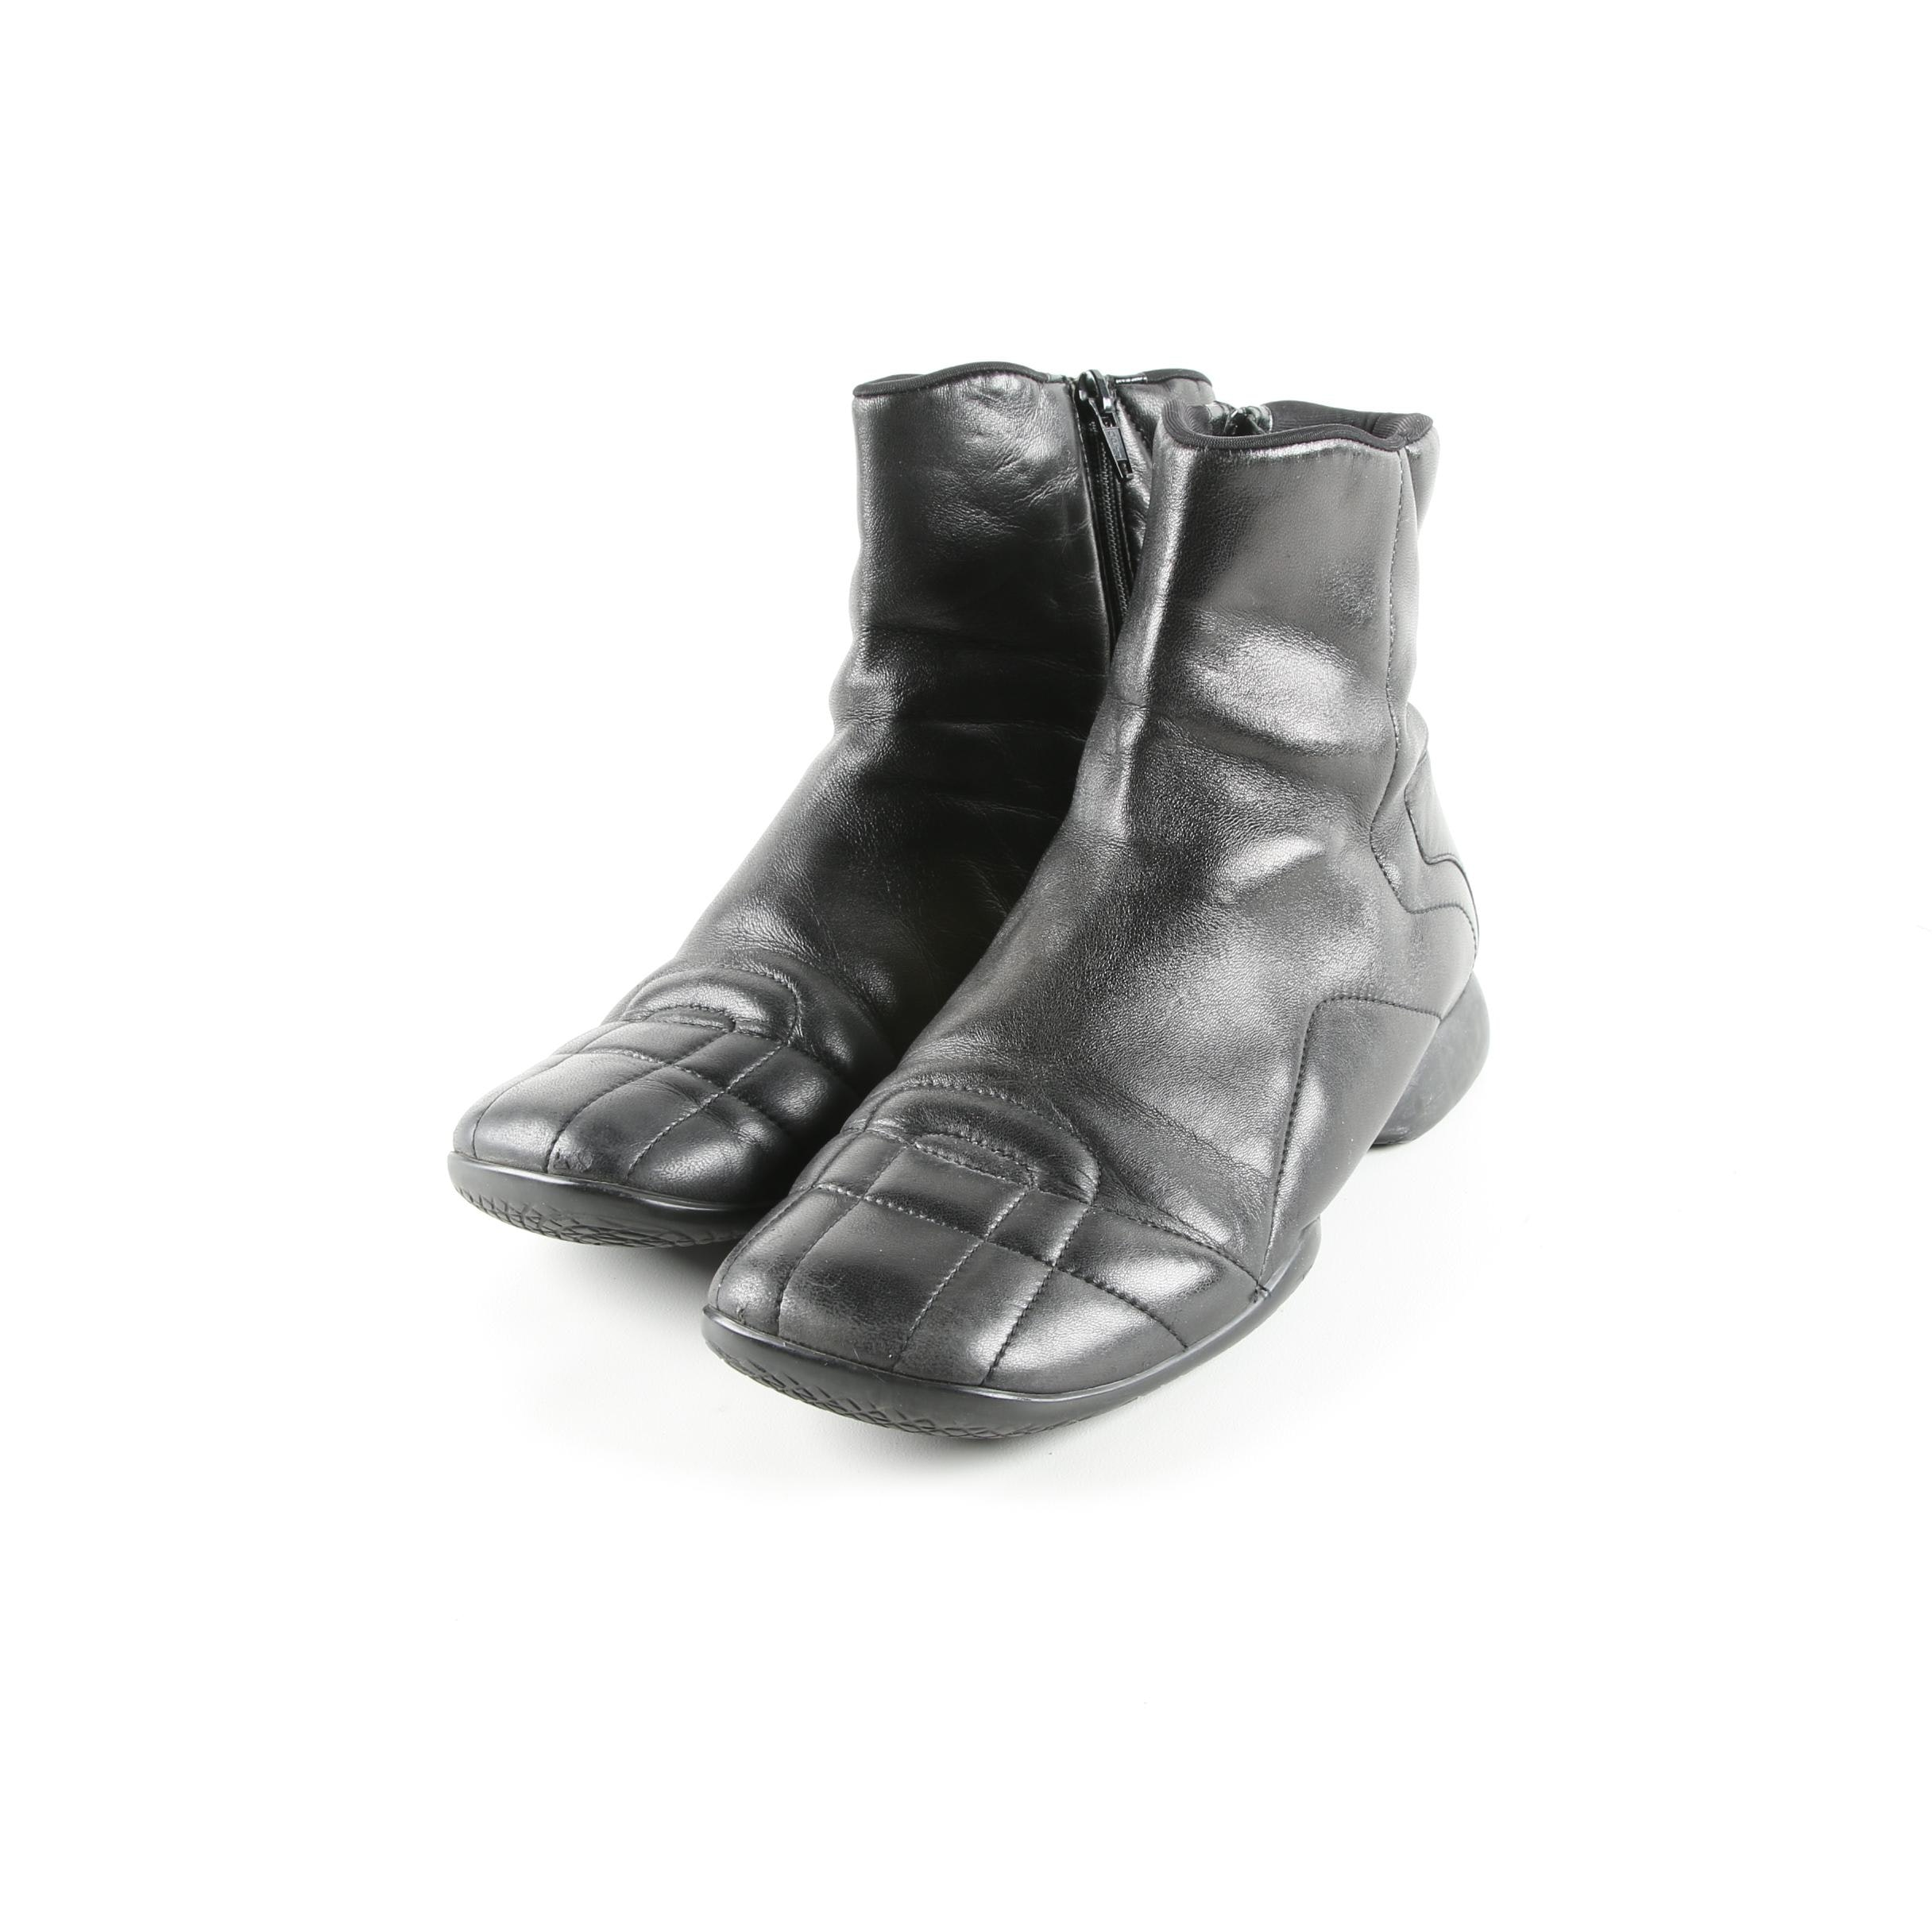 Women's Prada Black Leather Boots